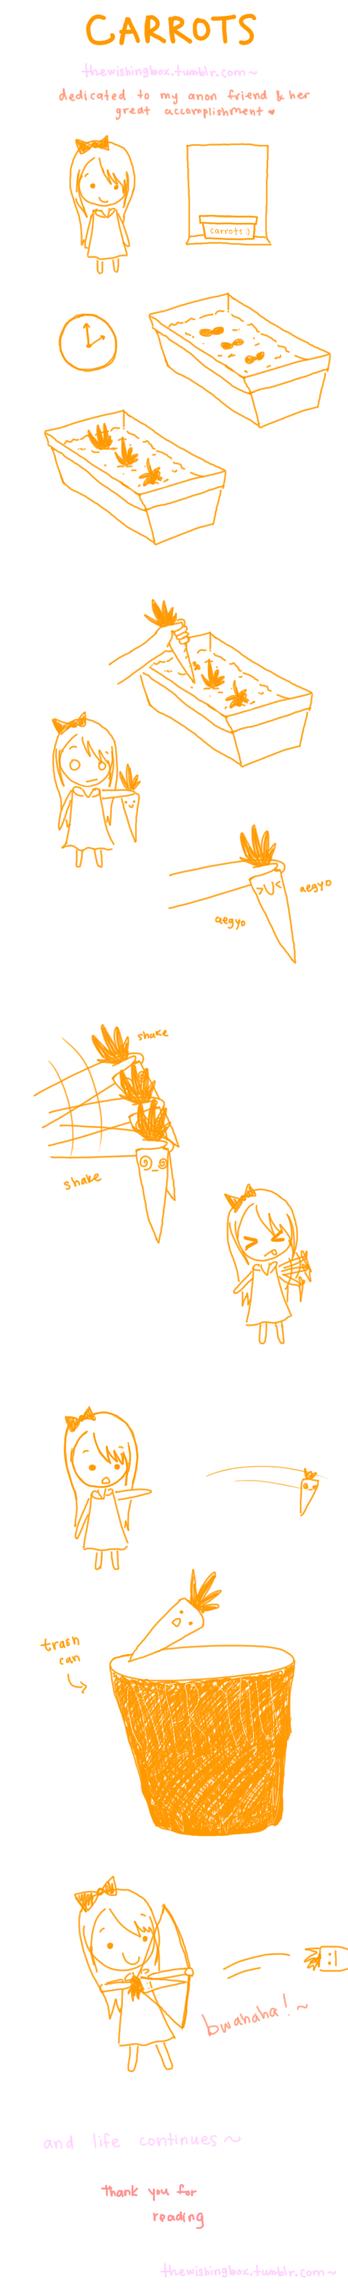 carrots by DreamingWishWing